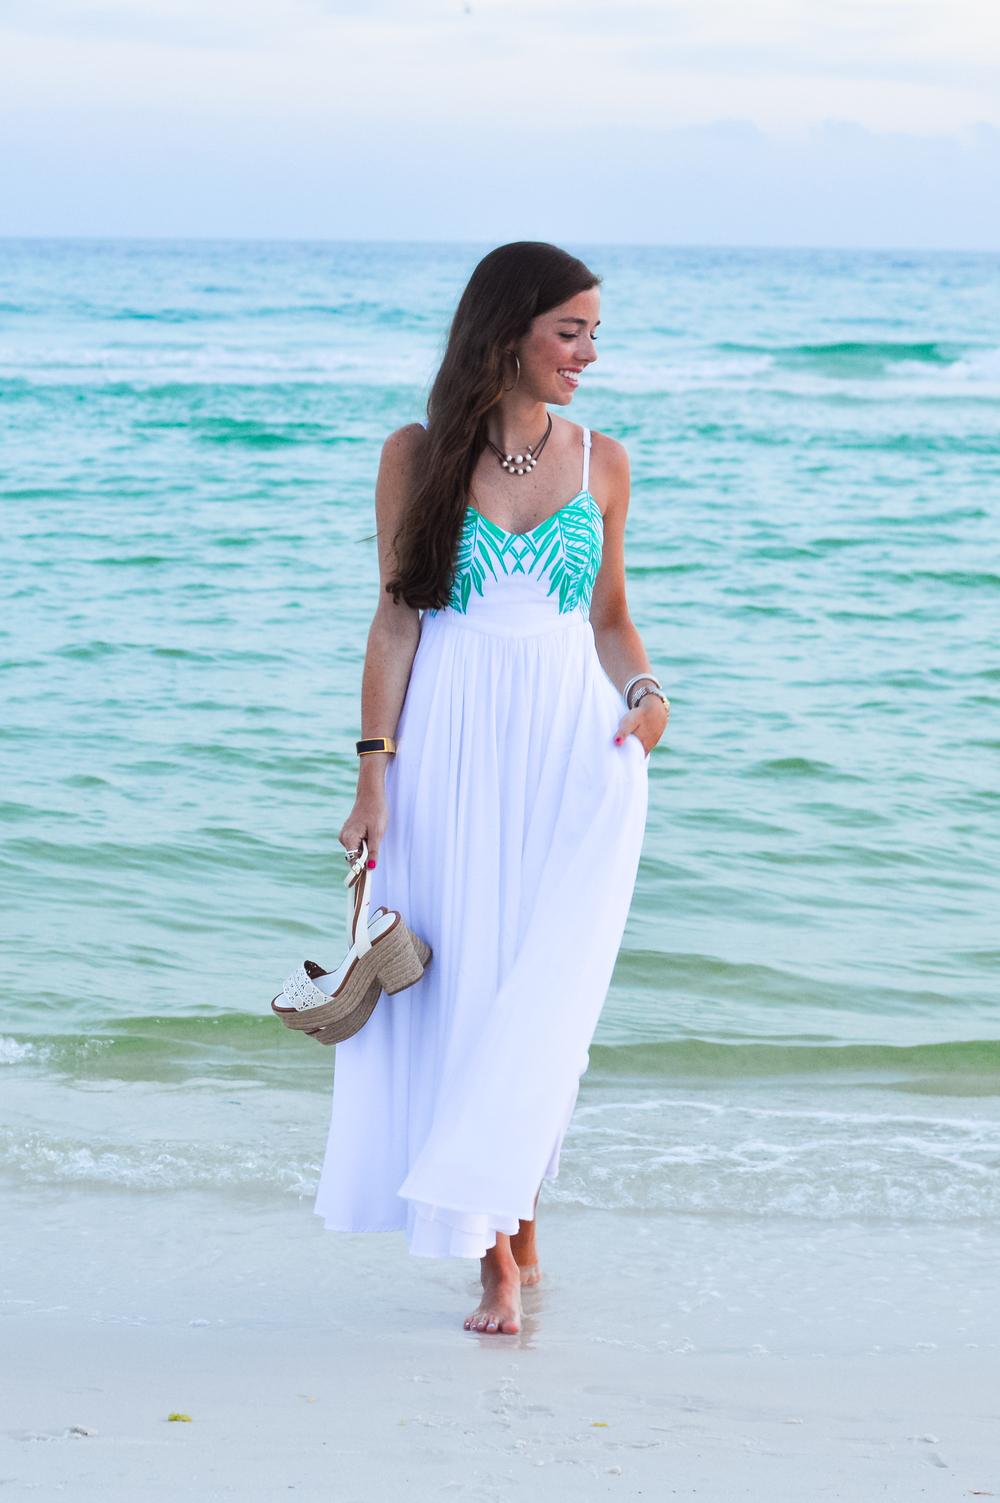 lcb_style_fashion_blogger_seaside florida (22 of 32).jpg